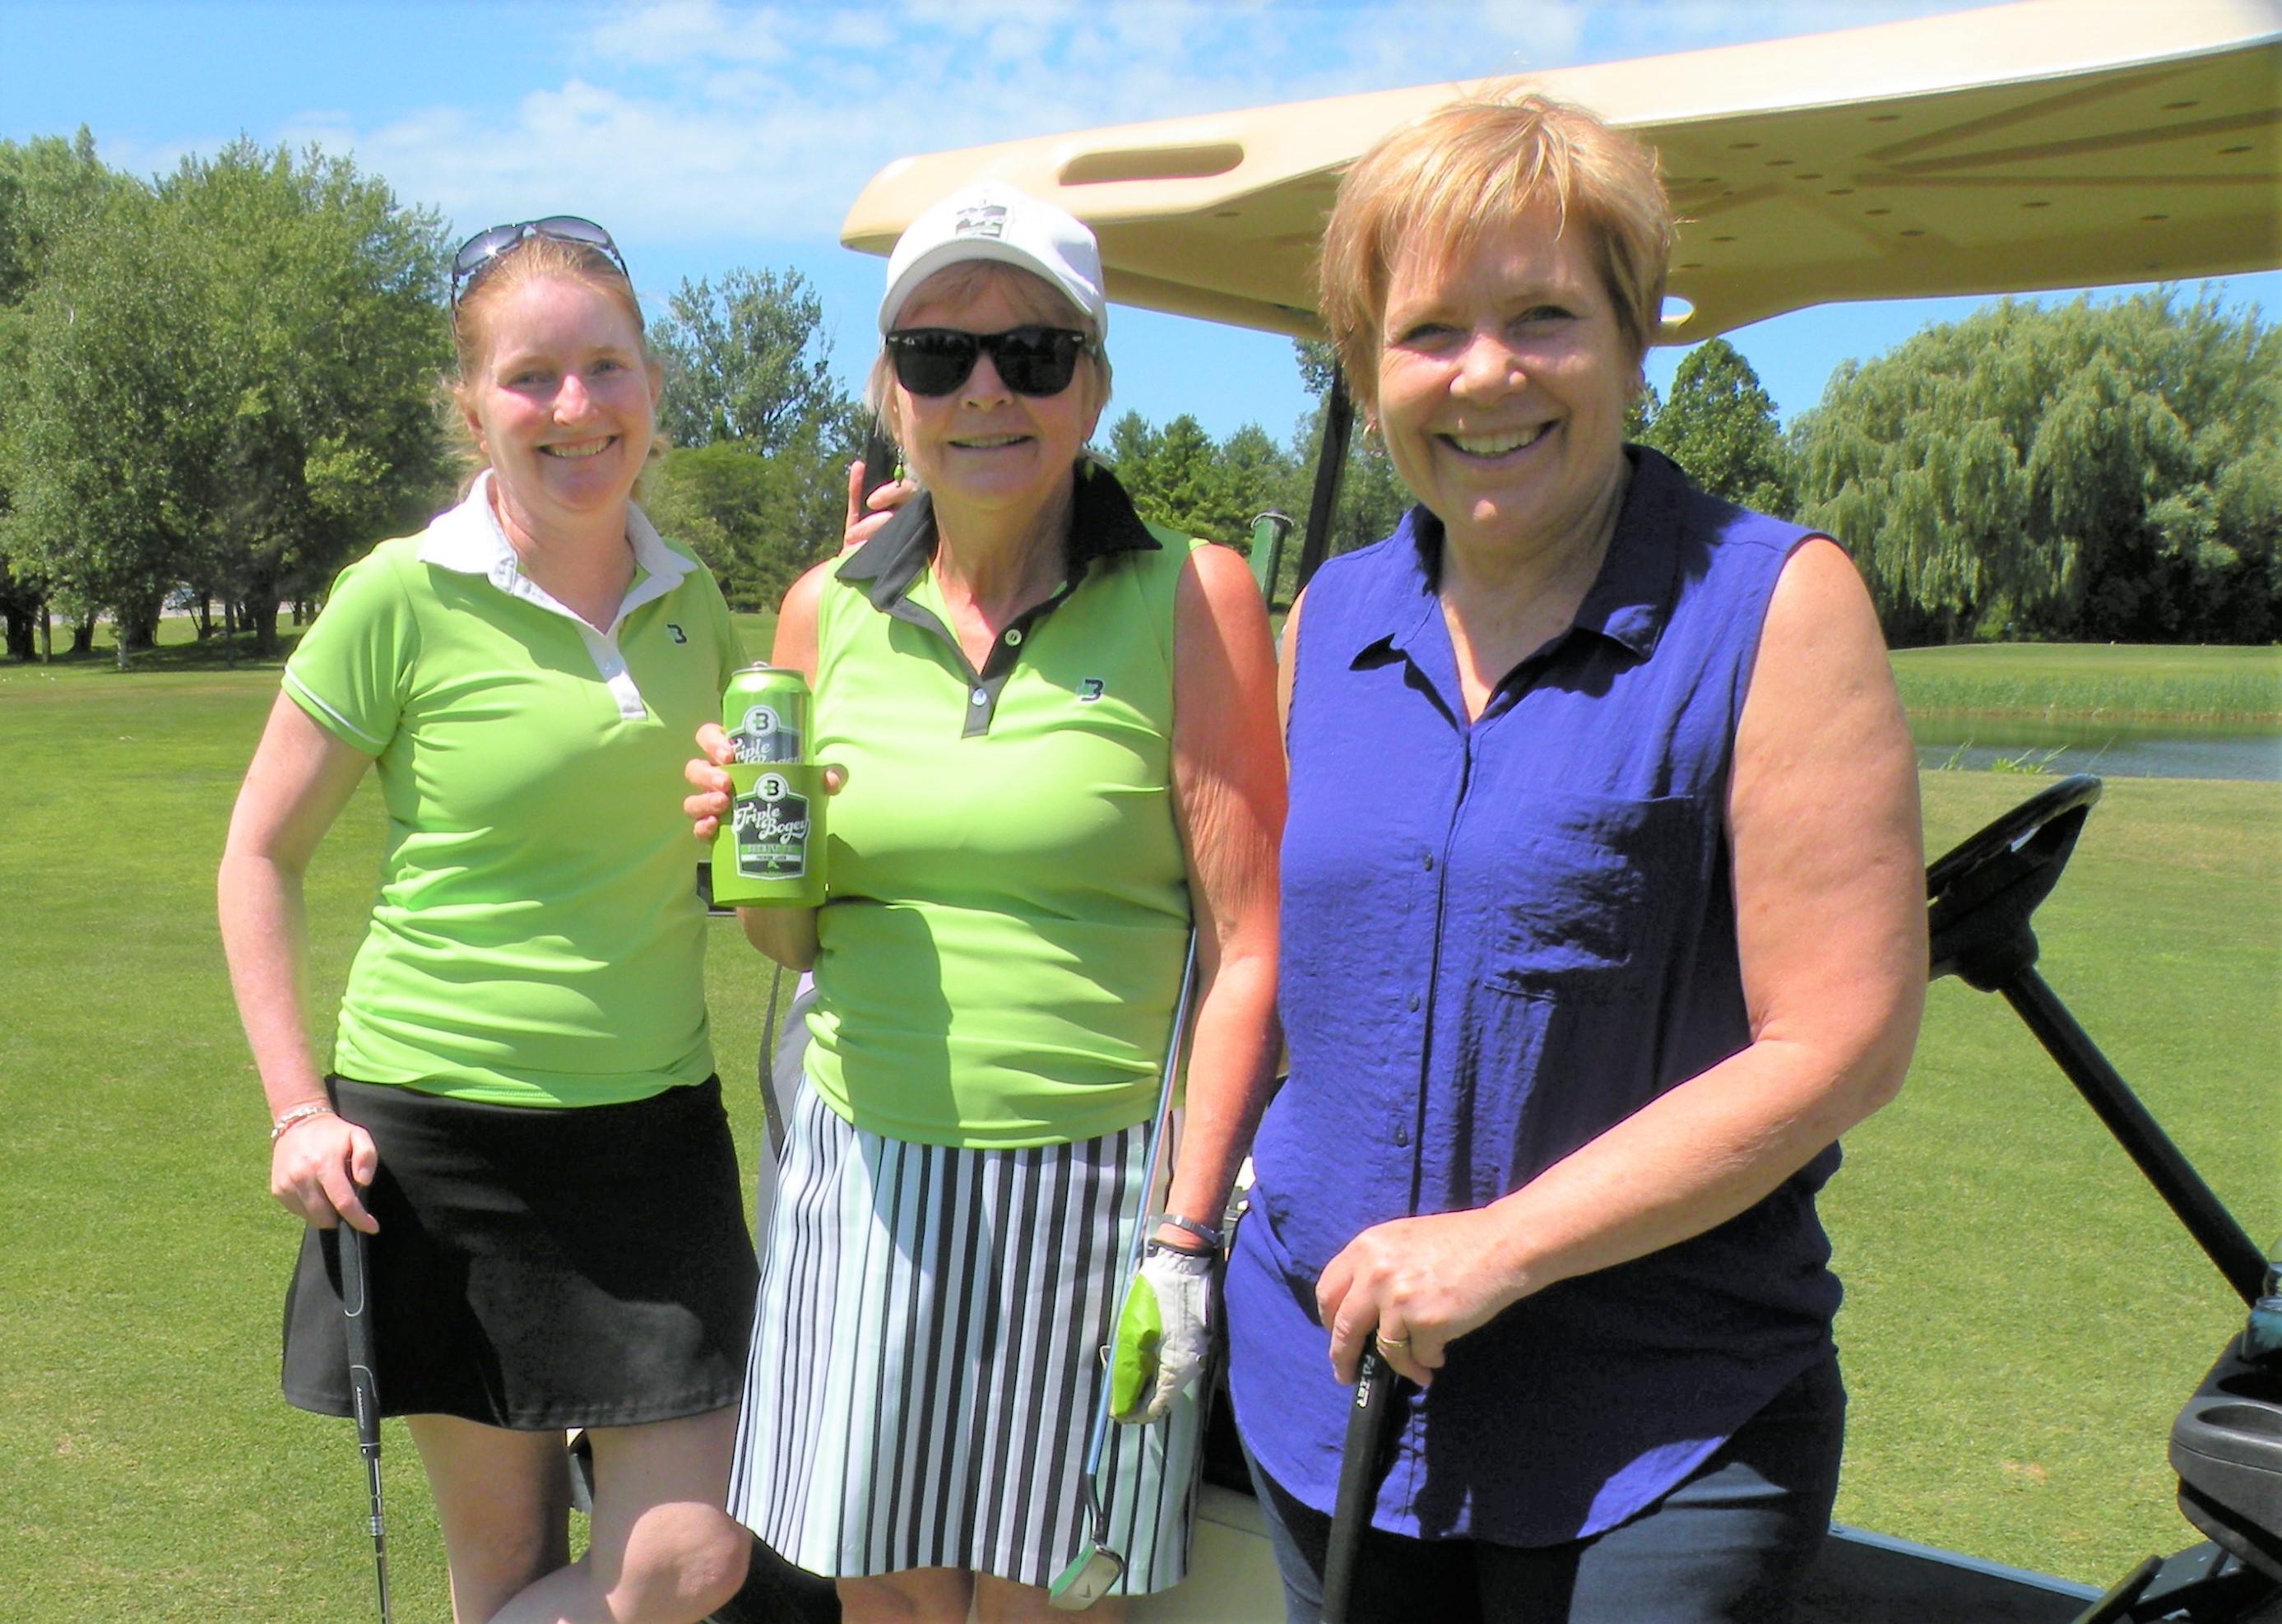 Some happy golfers